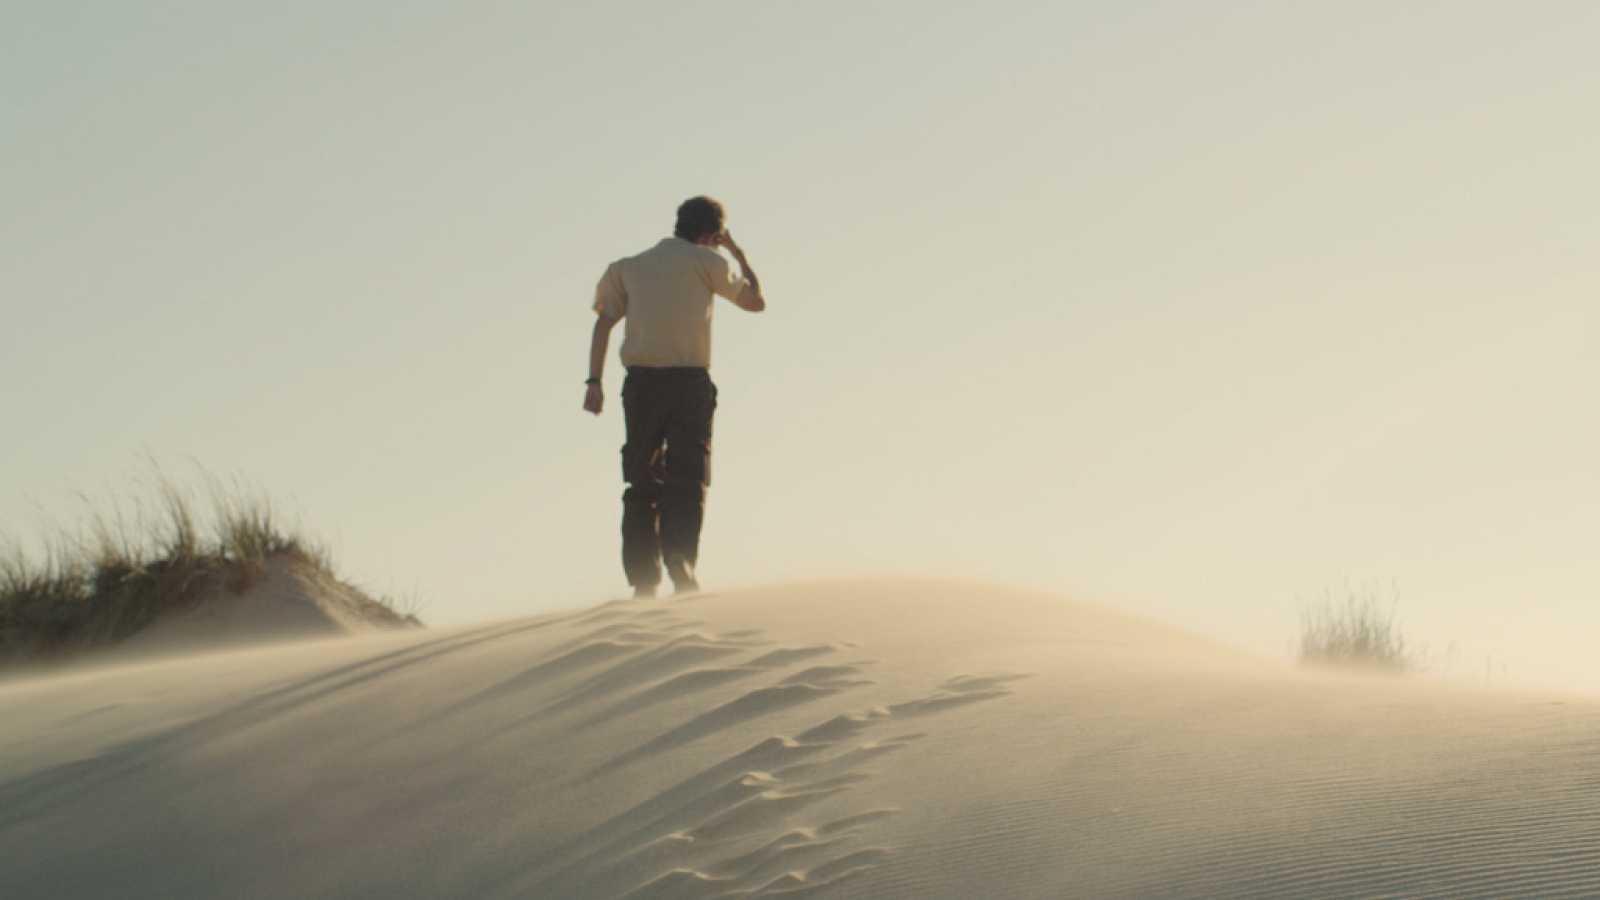 Кинопоказ онлайн «Море смотрит на нас издалека» (Испания)